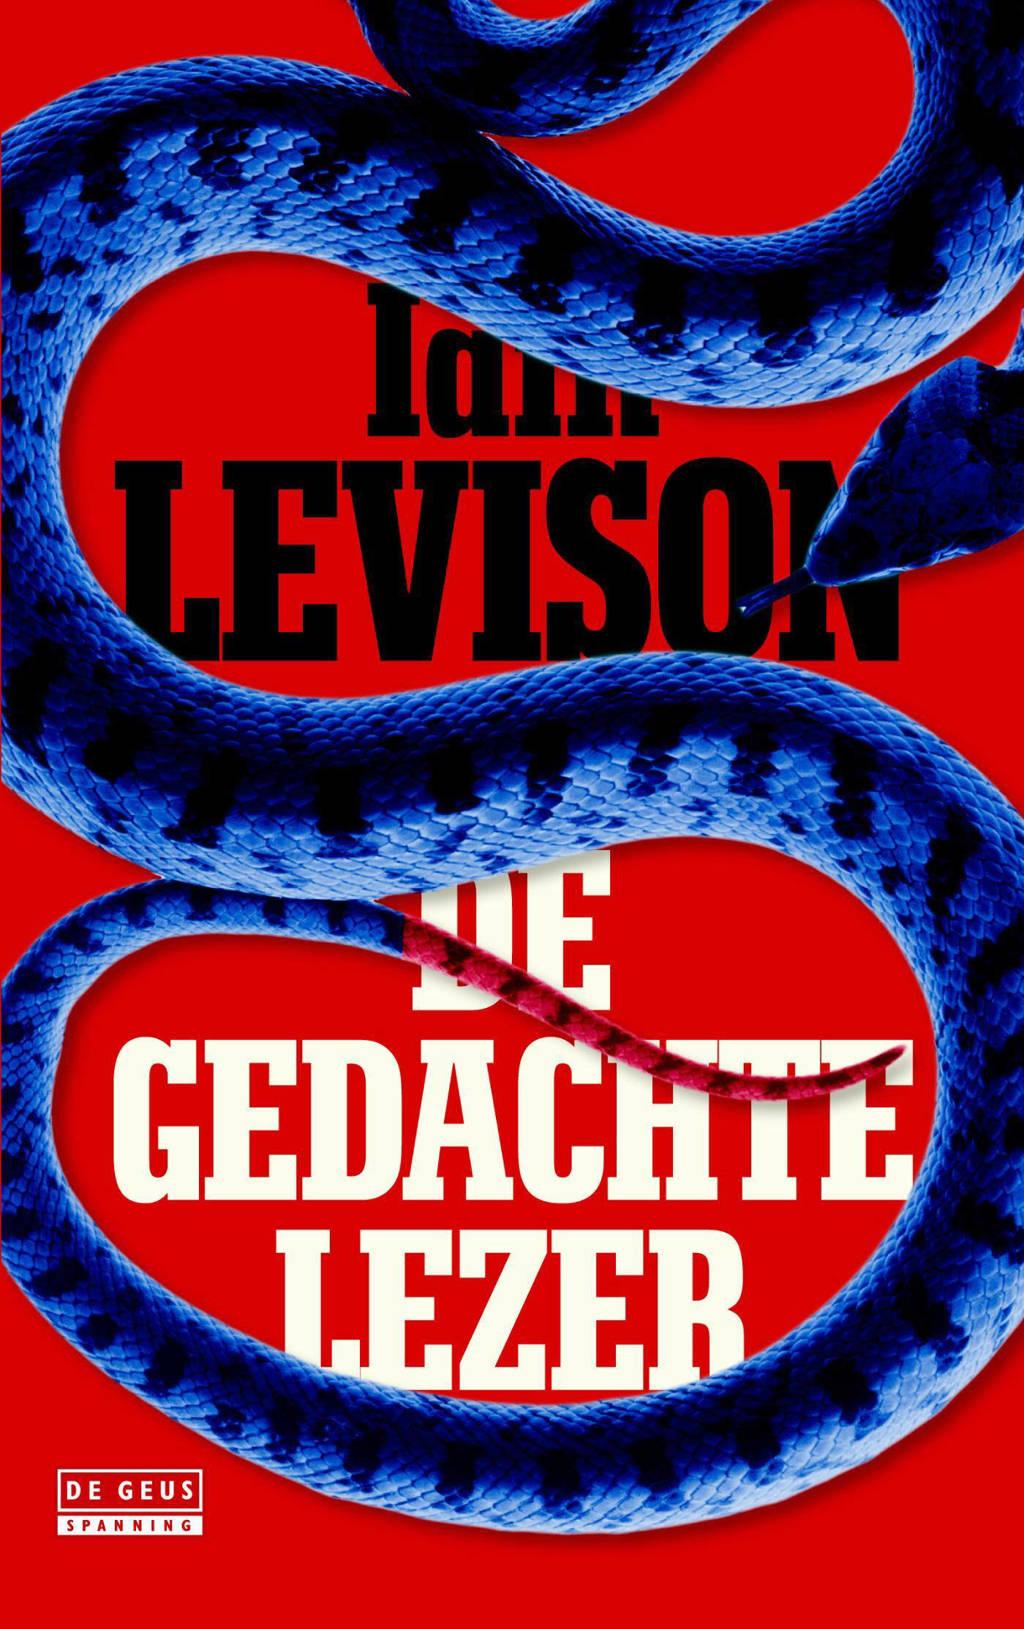 De gedachtelezer - Iain Levison